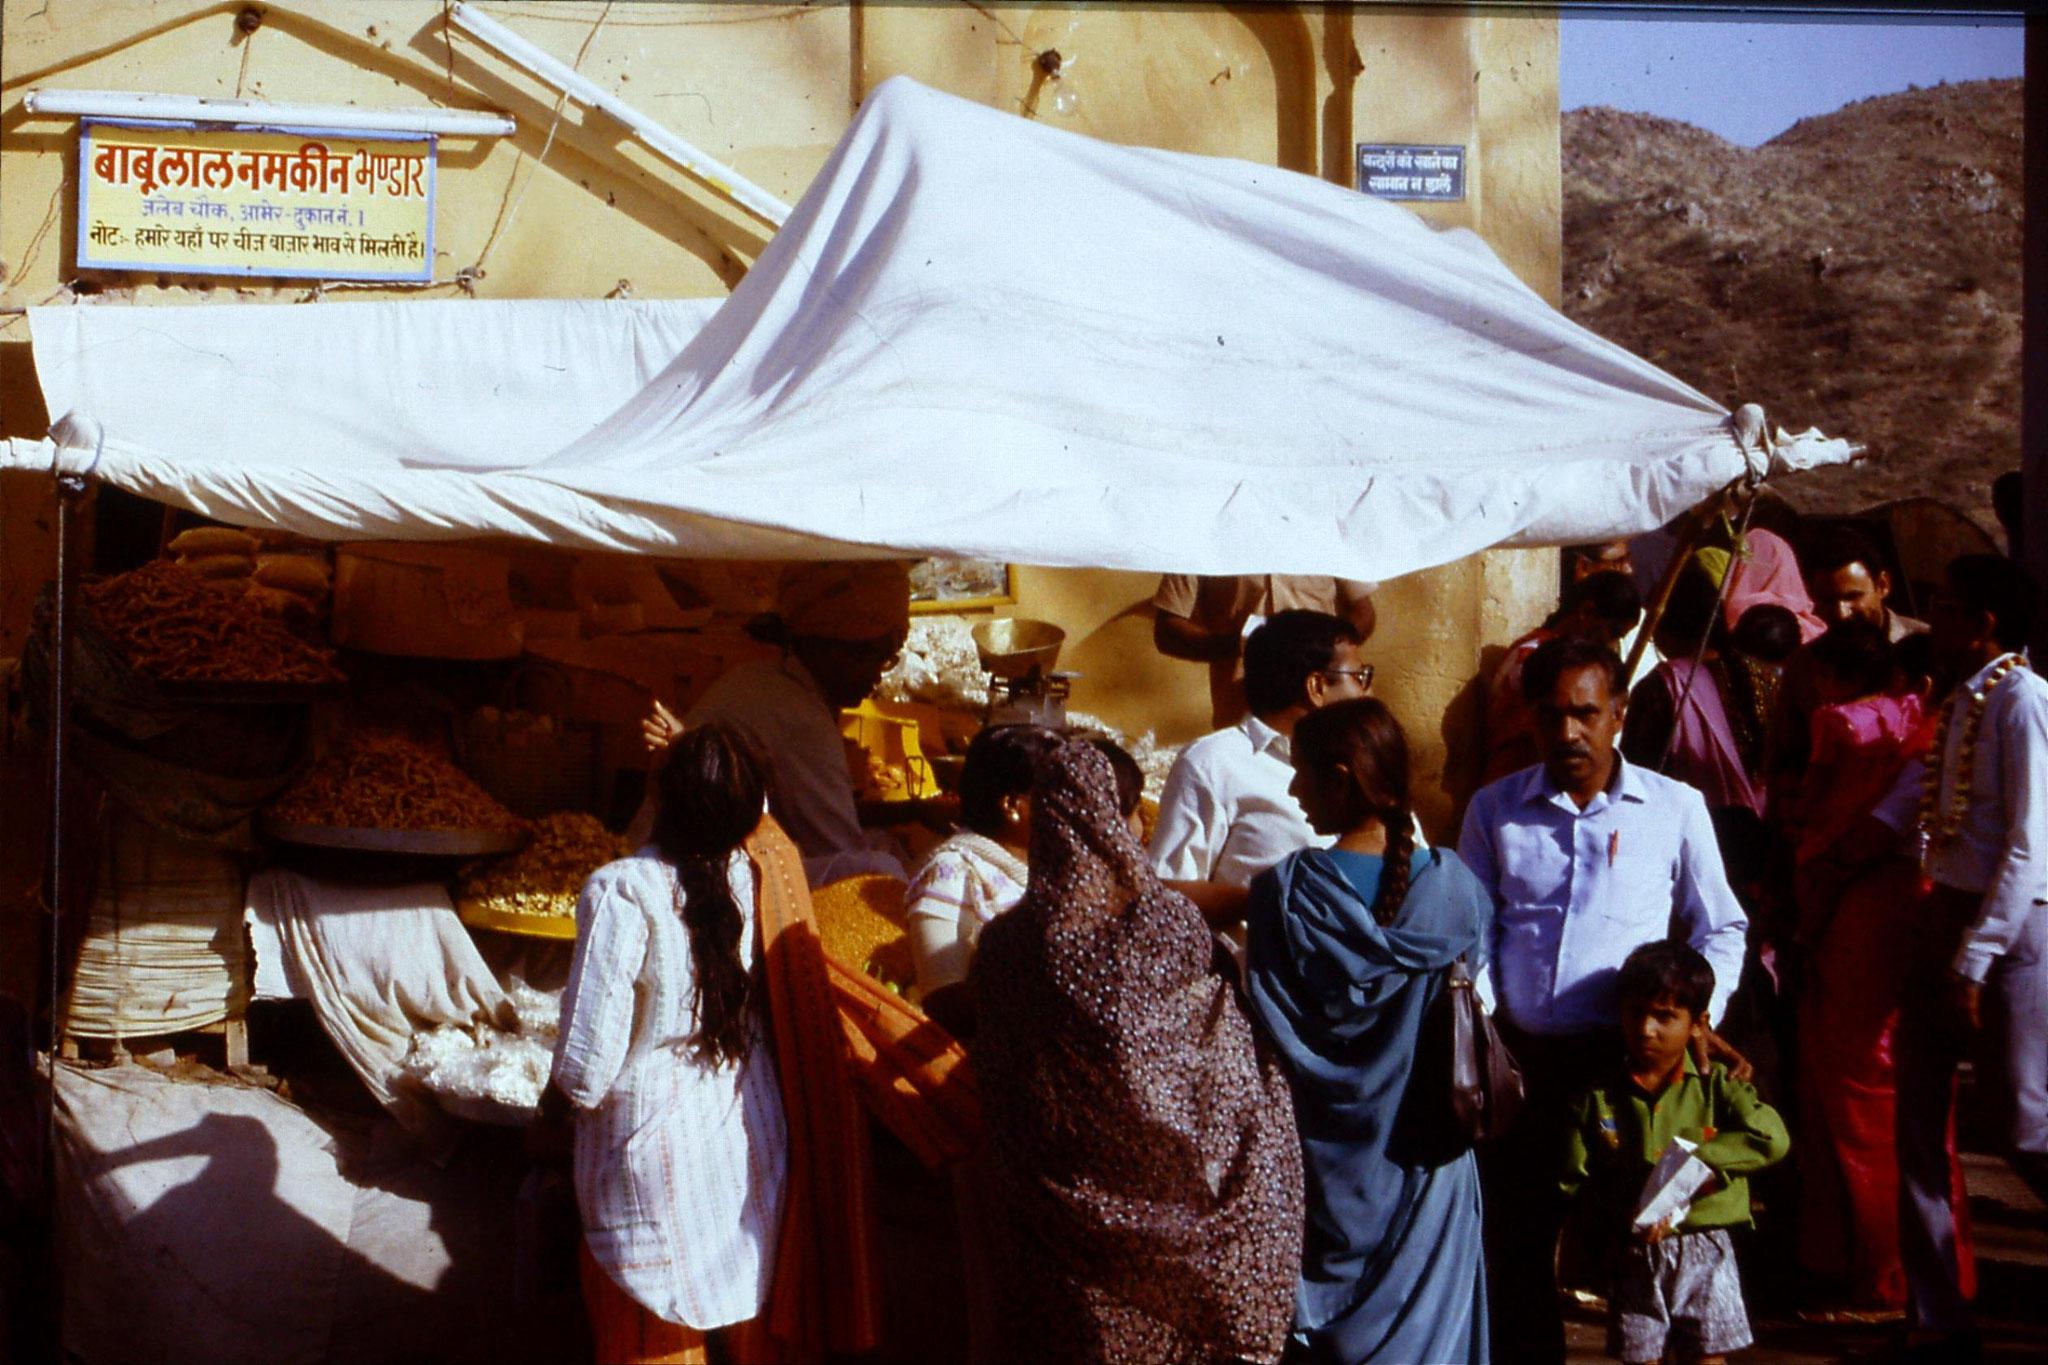 109/17: 3/4/1990 Jaipur/Amber - sweet stall